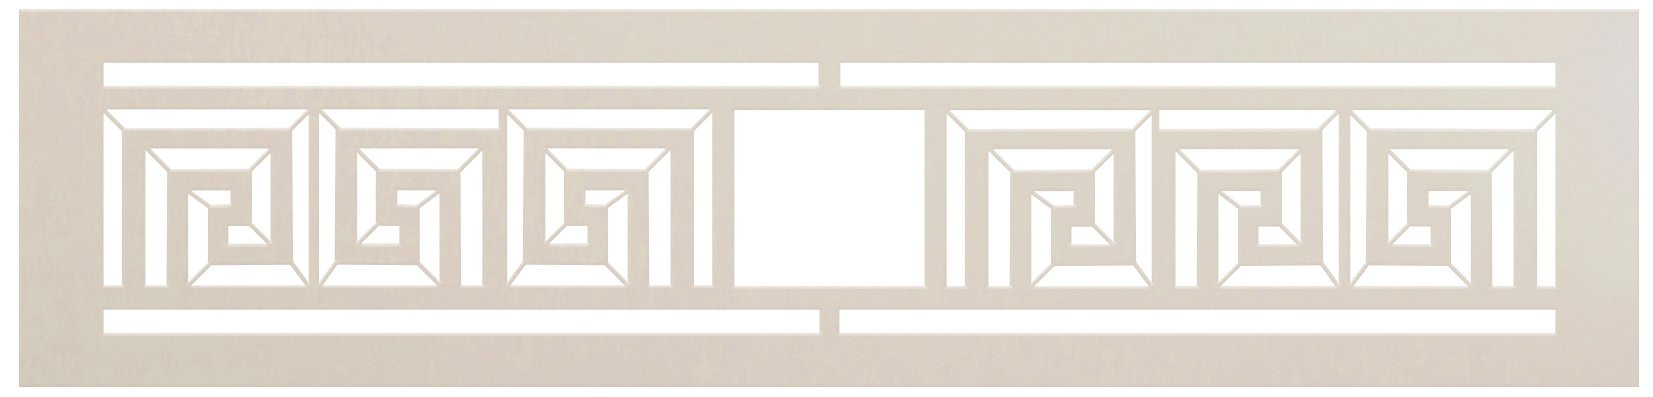 Meander Square Spiral Pattern Stencil by StudioR12 | DIY Greek Key Border Home Decor | Craft & Paint Wood Sign | Reusable Mylar Template | Select Size